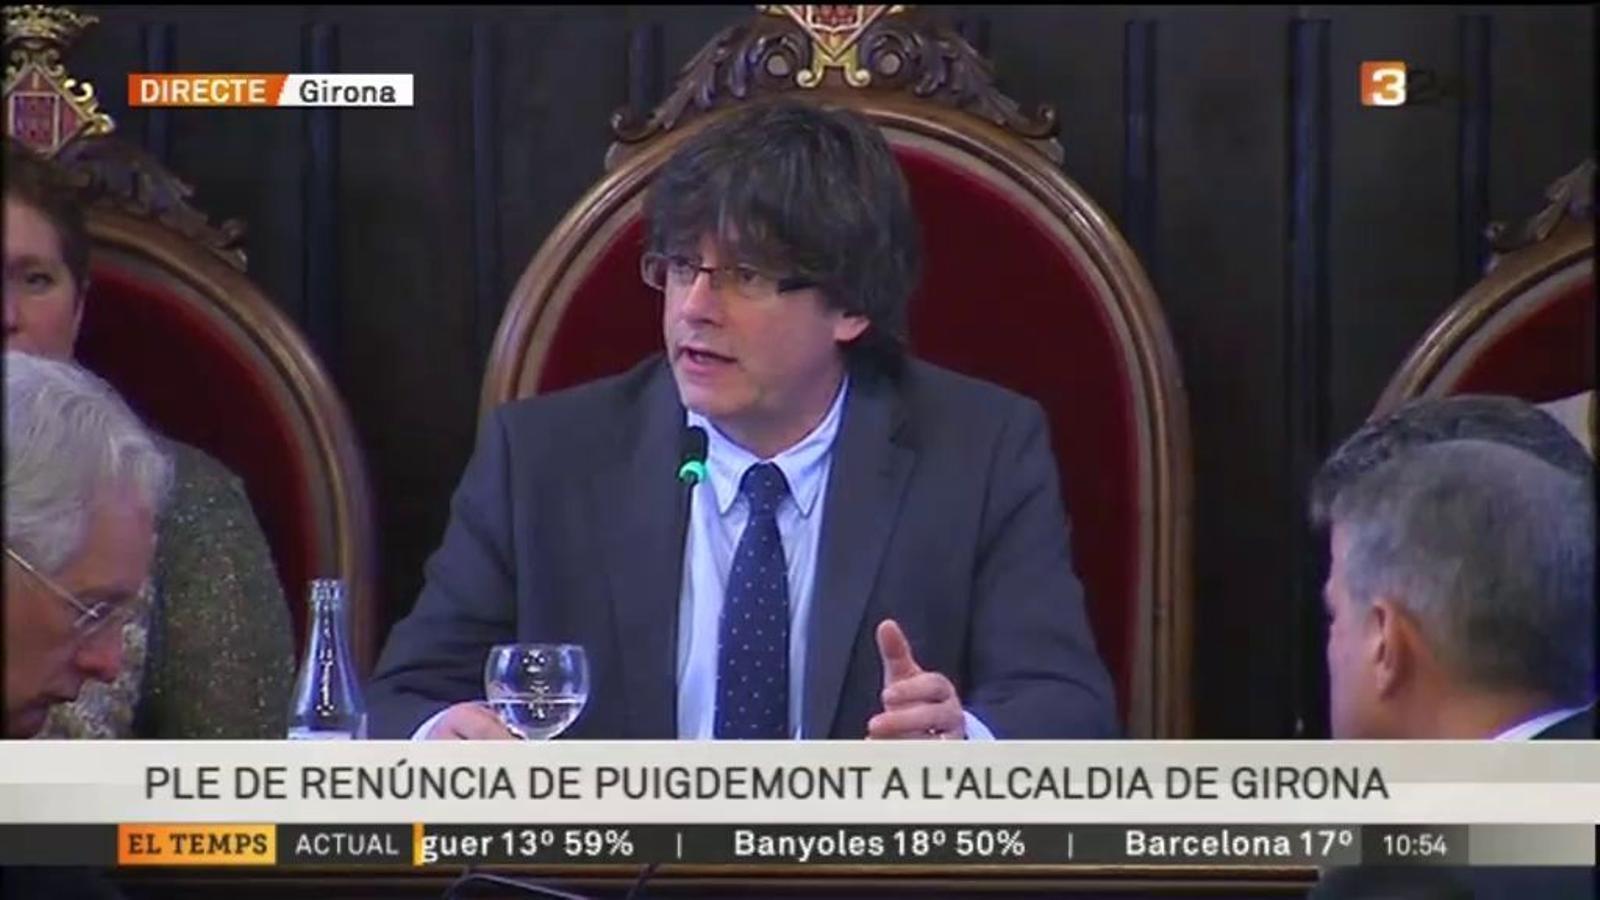 Ple de renúncia de Carles Puigdemont com a alcalde de Girona